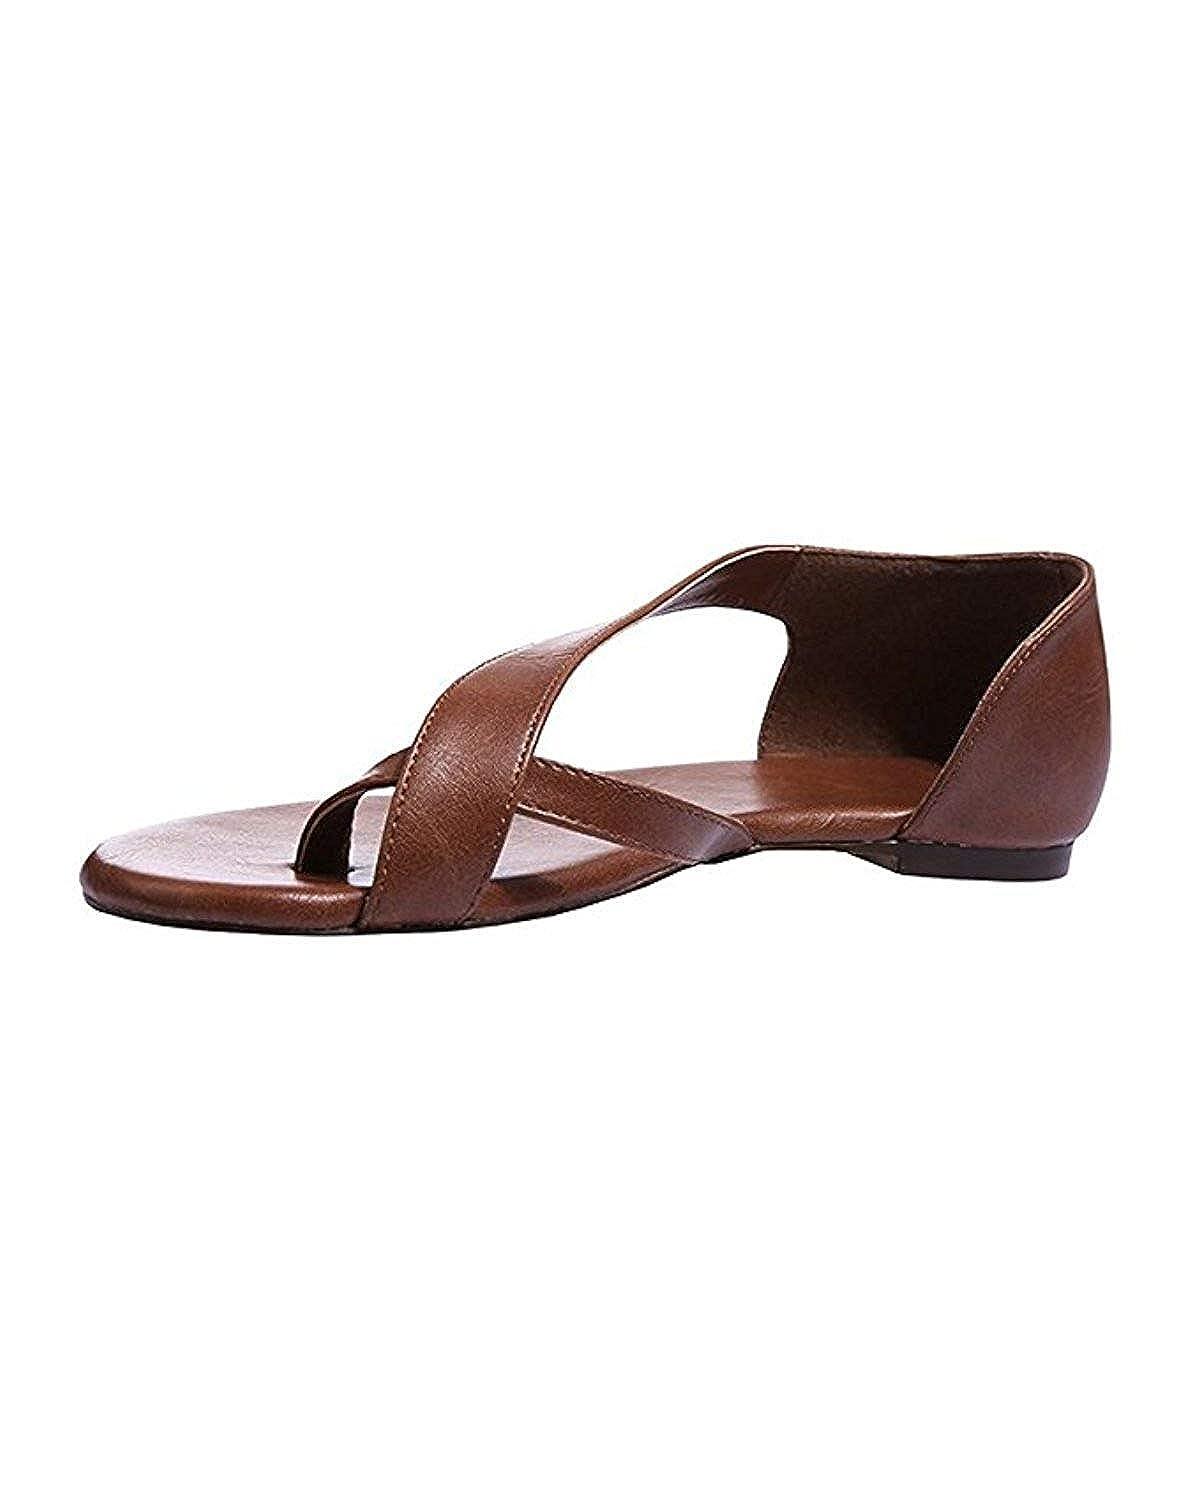 Huiyuzhi Womens Slip On Flip Flops Ring Toe Strappy Summer Gladiator Flat Sandals